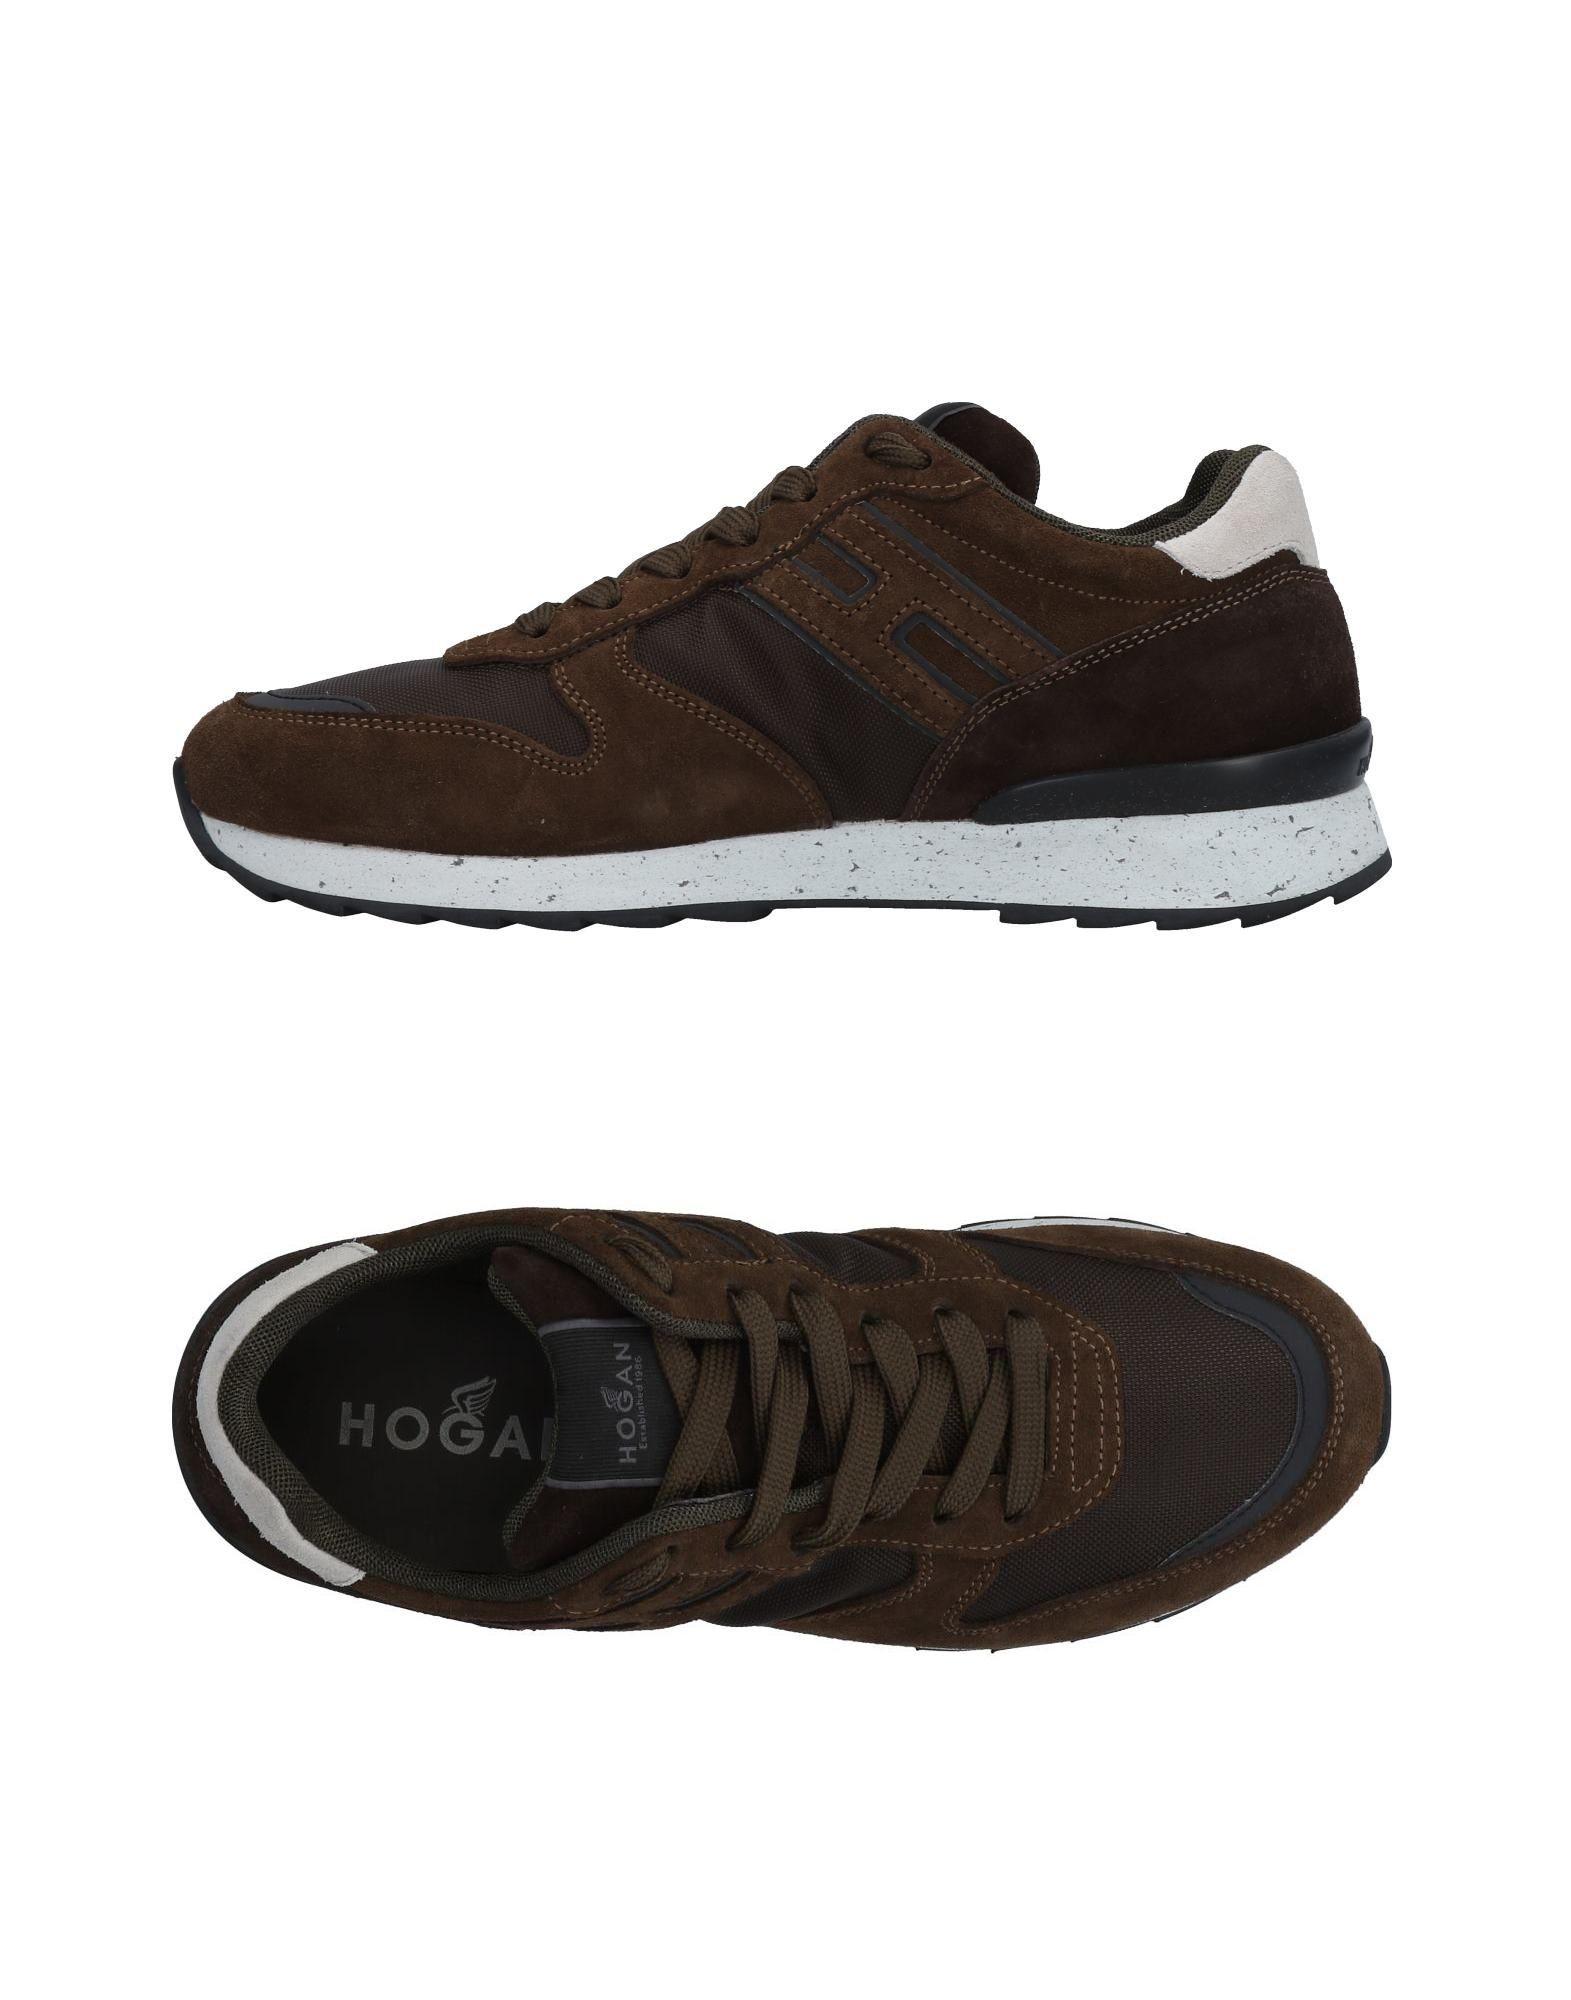 Hogan Sneakers Herren  11486034VN Gute Qualität beliebte Schuhe